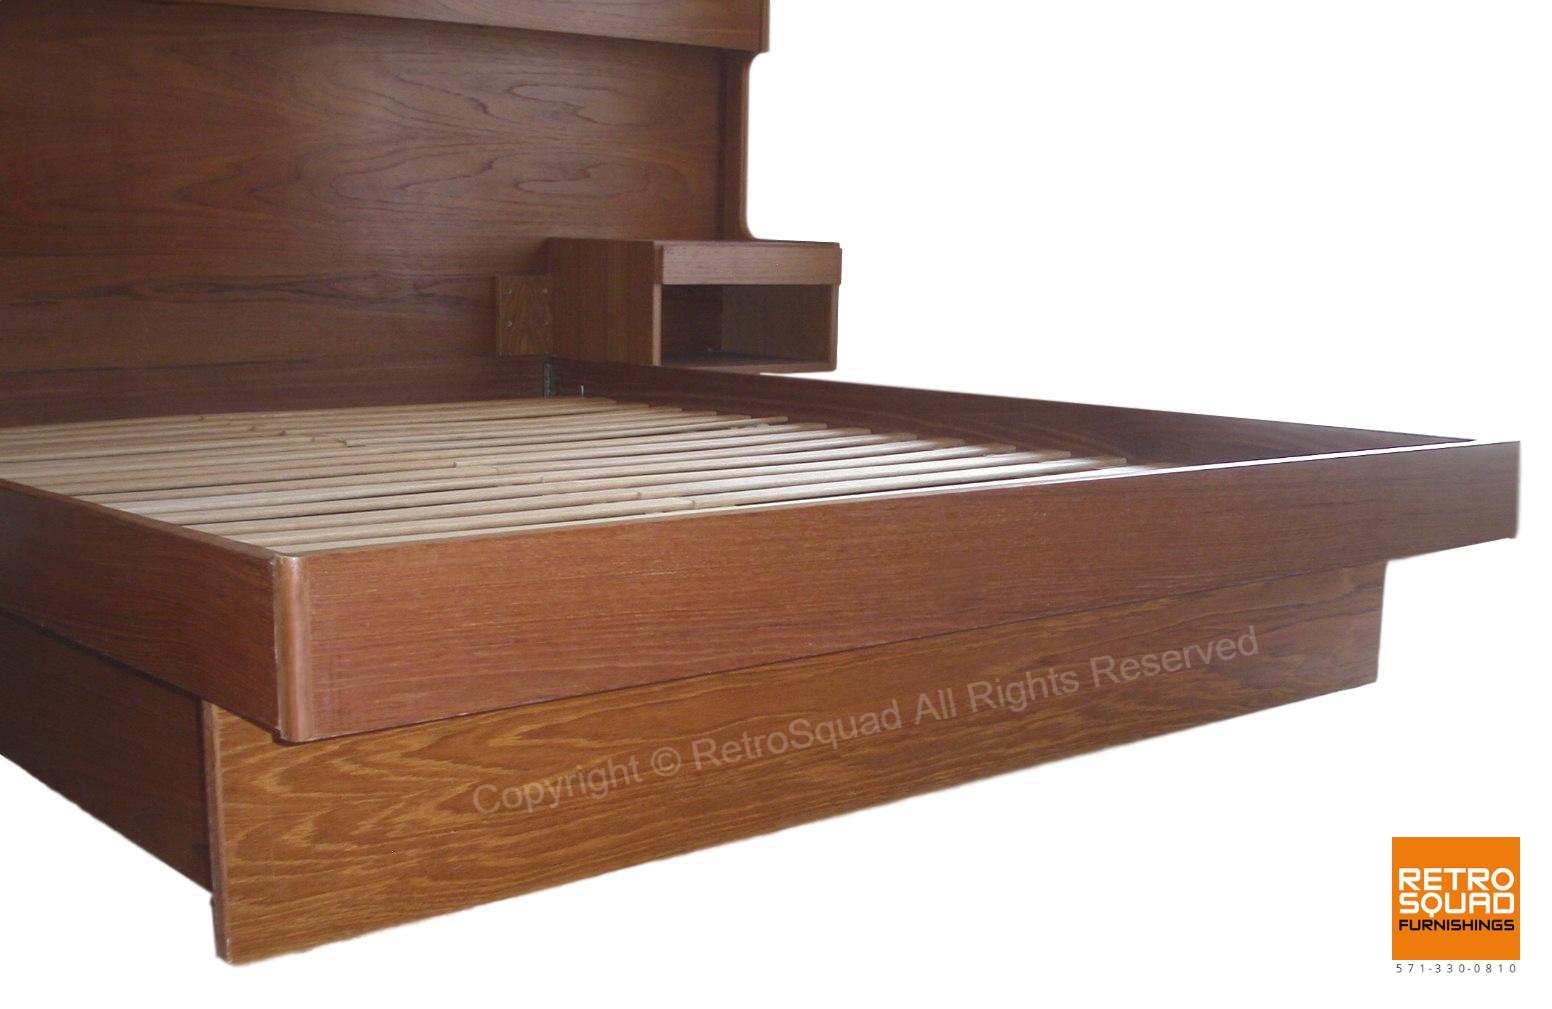 Danish-Modern-QUEEN-Size-Teak-Platform-Bed-With-Nightstands-Lighted-Headboard-from-Sannemanns-of-Denmark-04